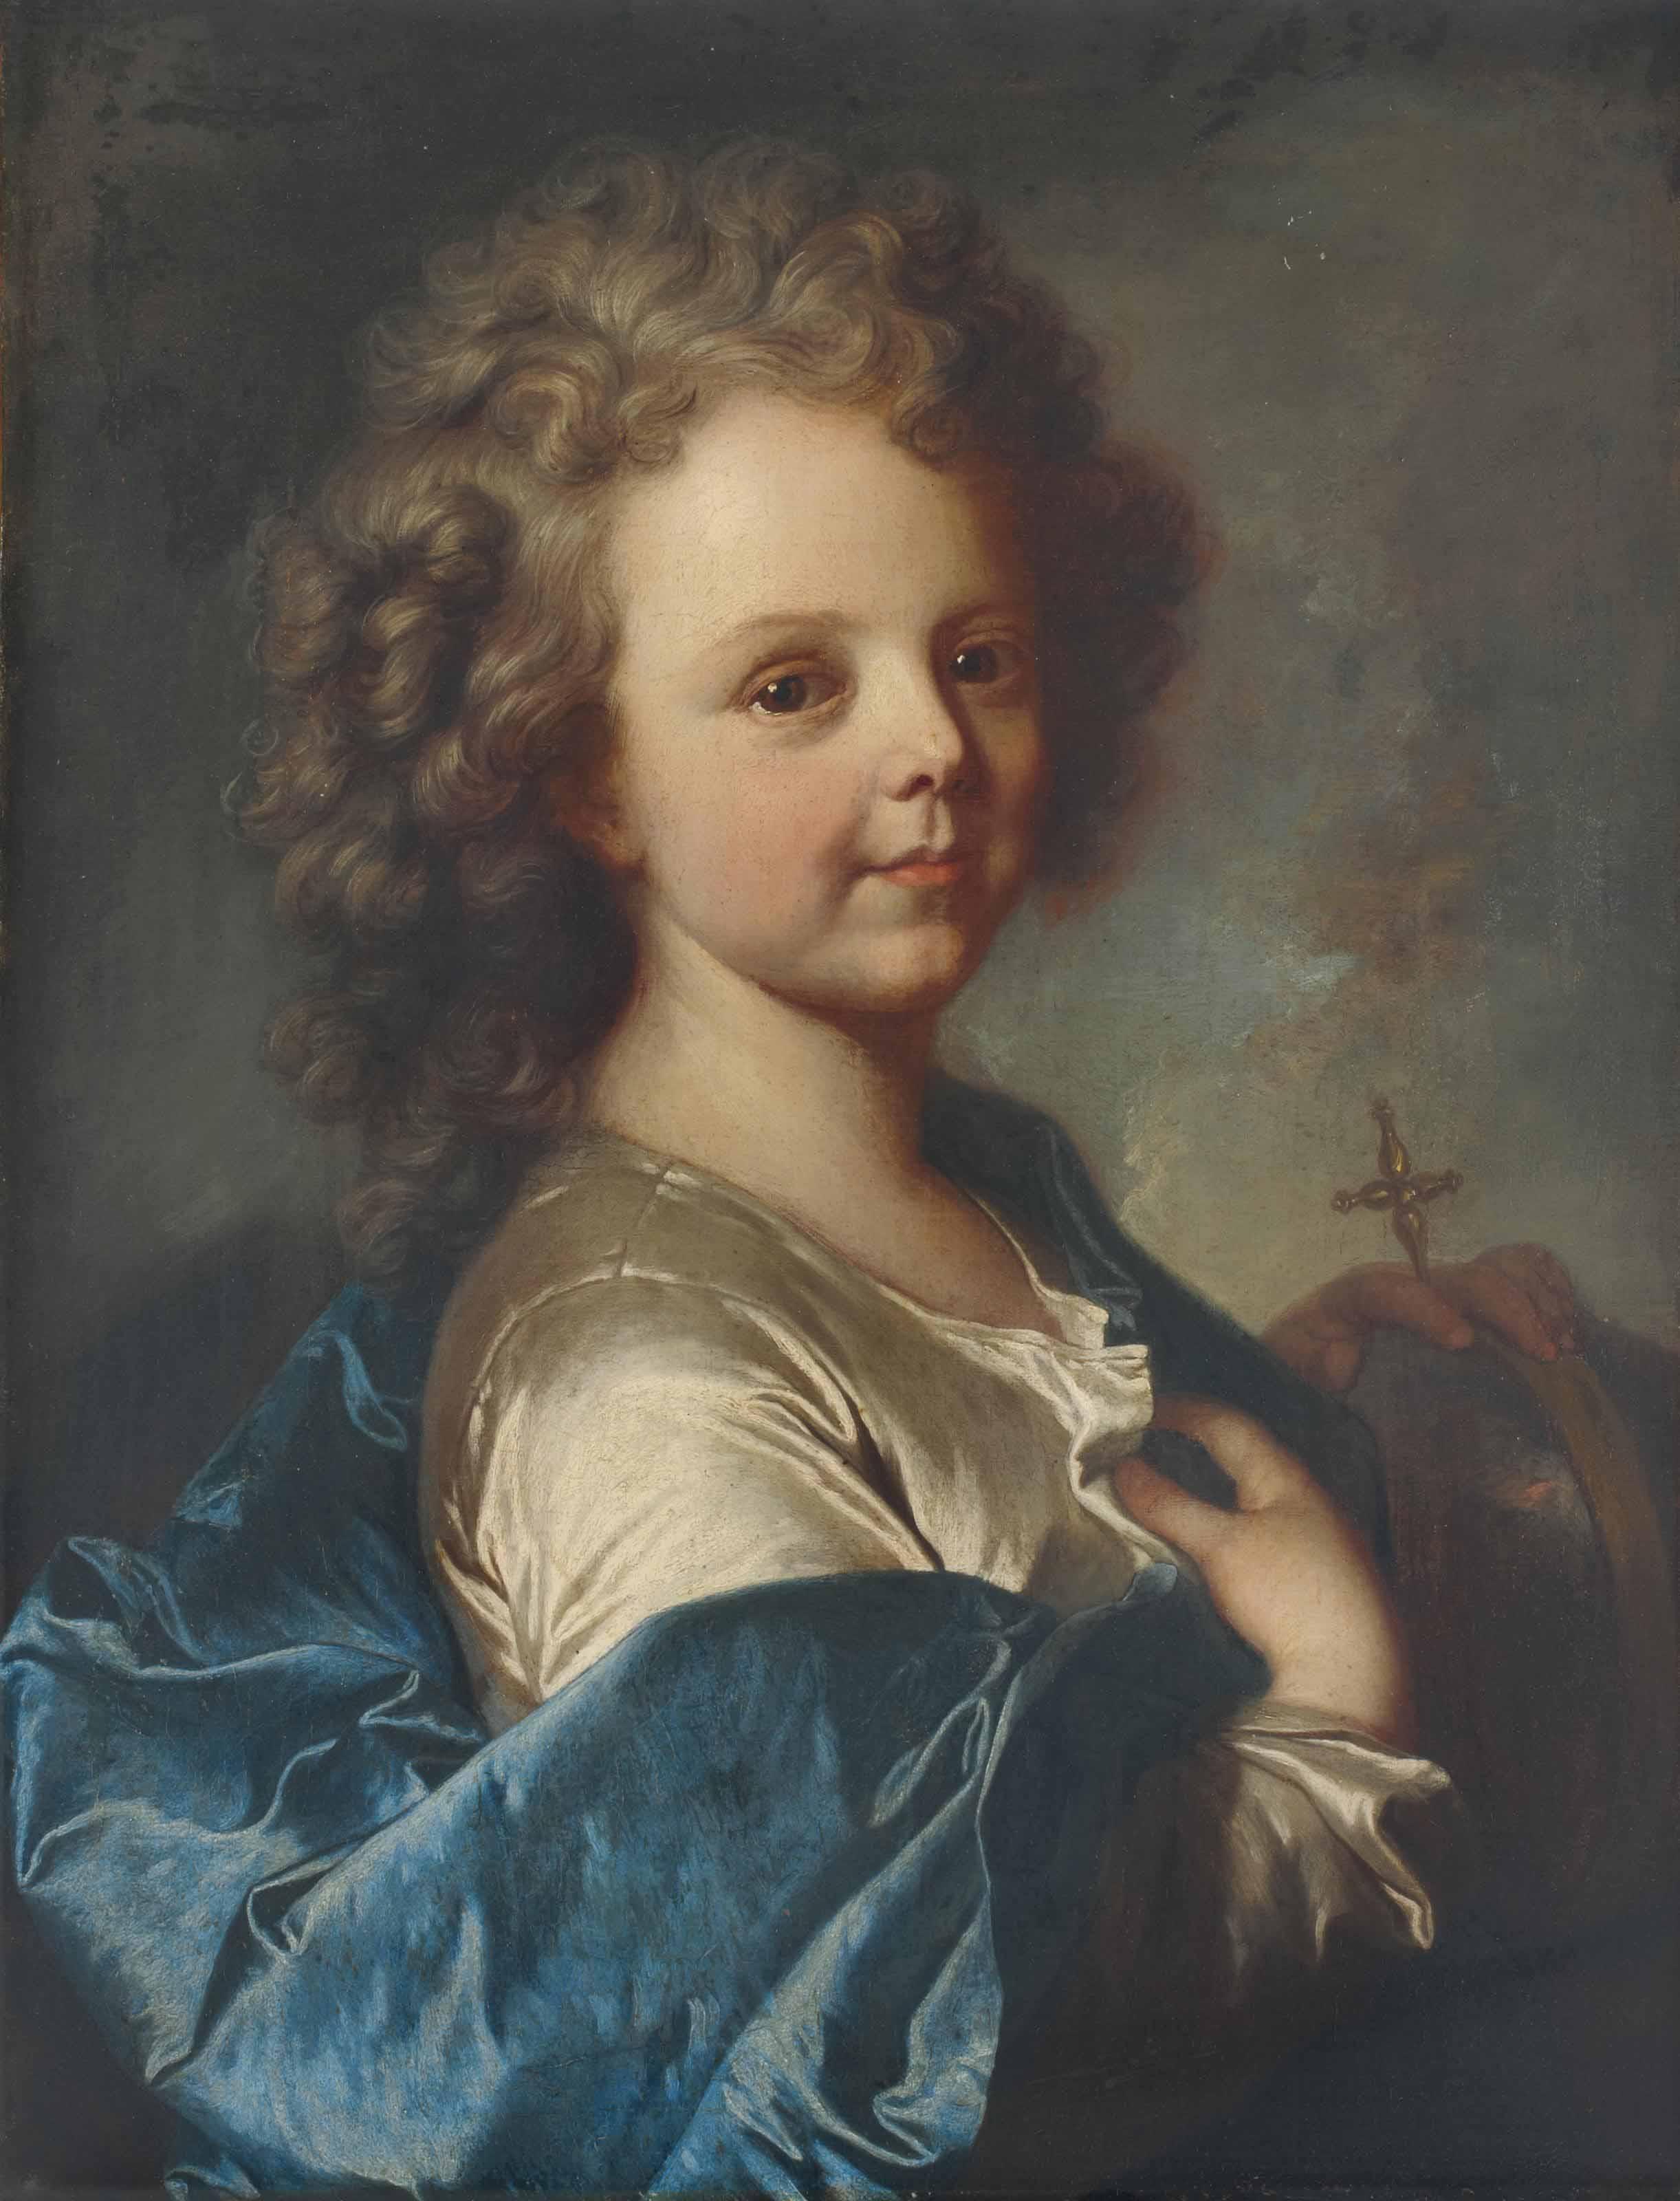 ENTOURAGE DE HYACINTHE RIGAUD (PERPIGNAN 1659-1743 PARIS)